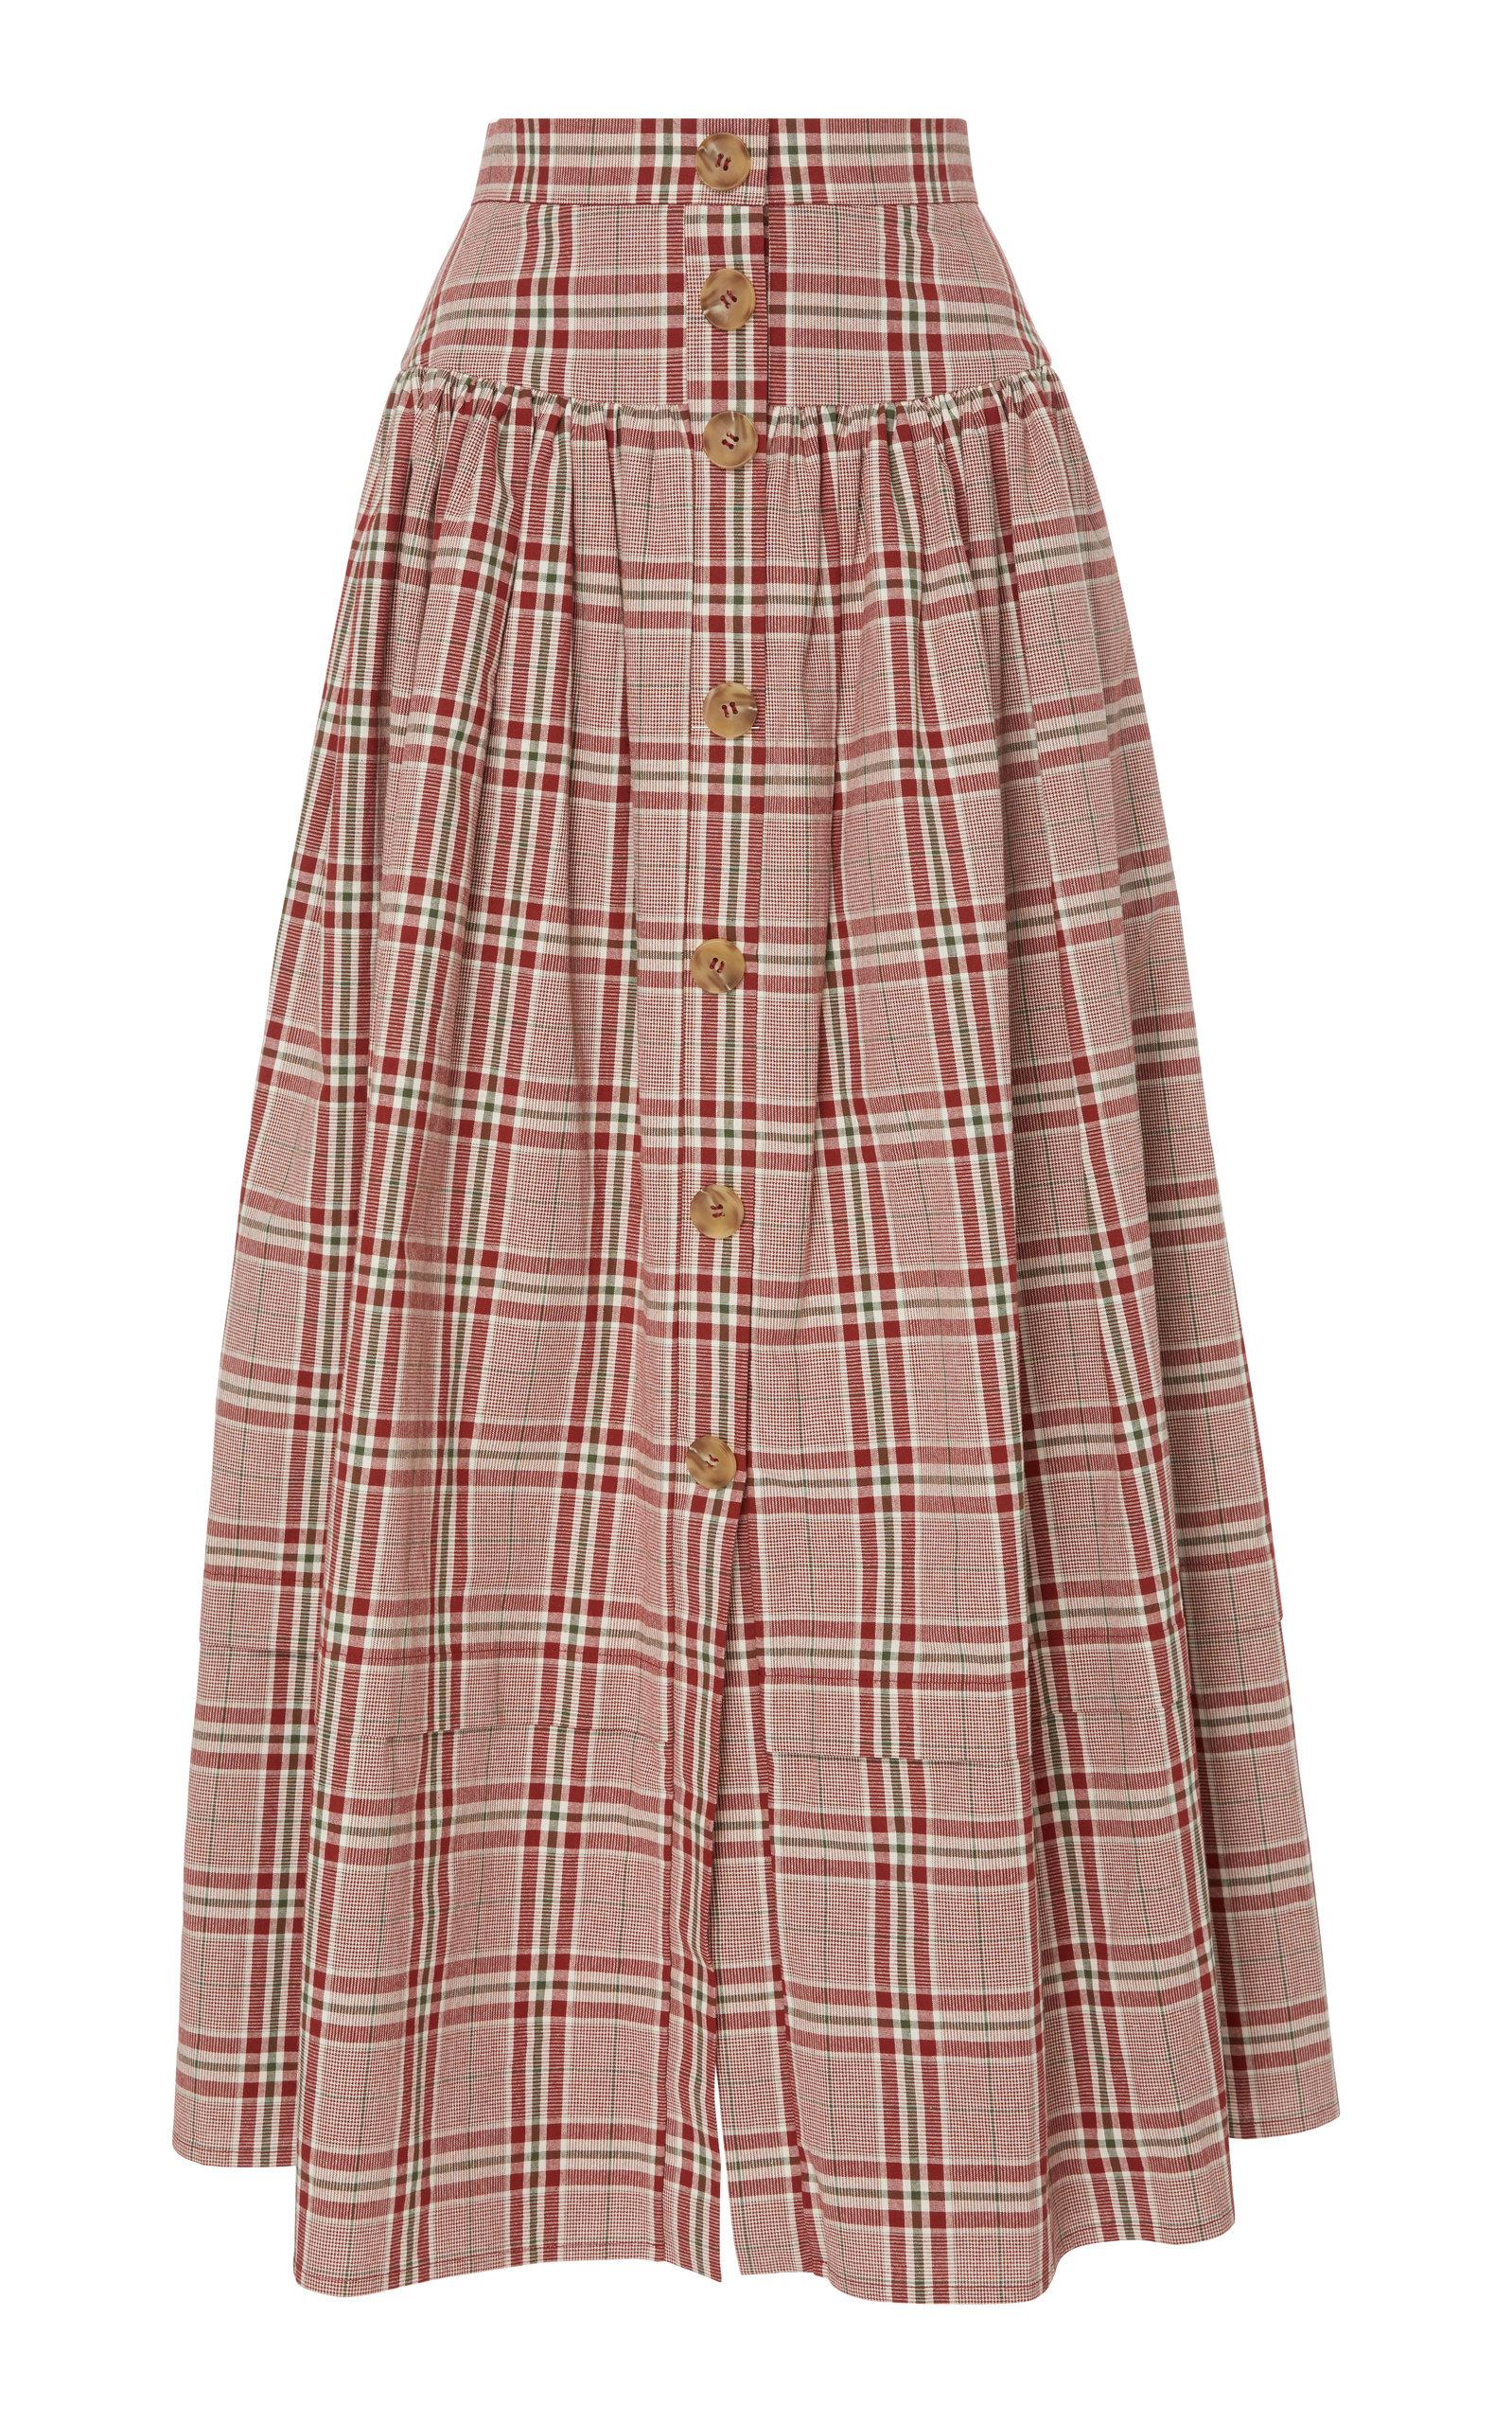 Freya Pleated Checked Cotton-Poplin Midi Skirt in Red